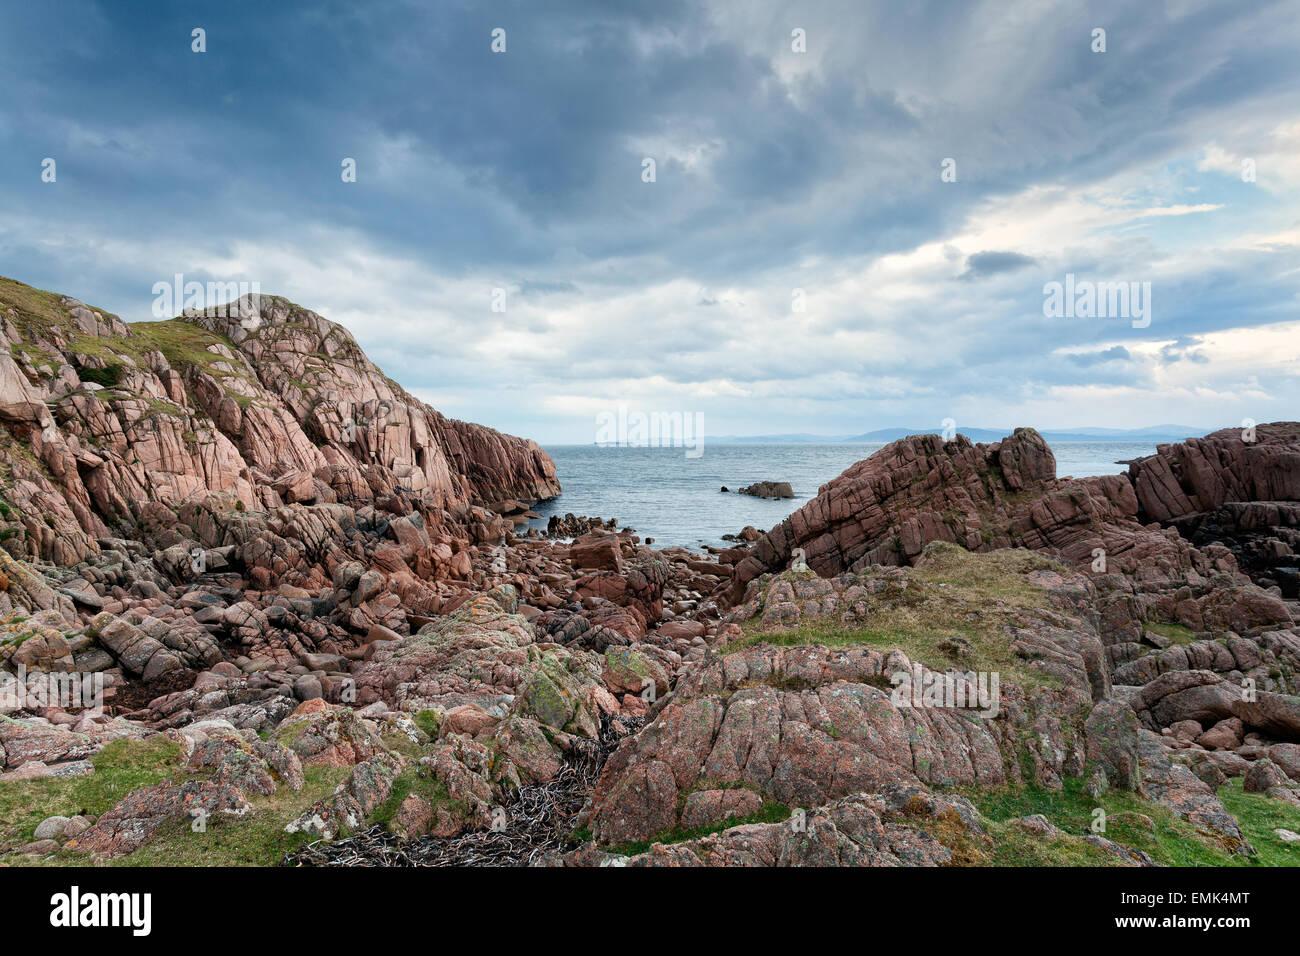 Rocky coast of Mull, Inner Hebrides, Scotland - Stock Image